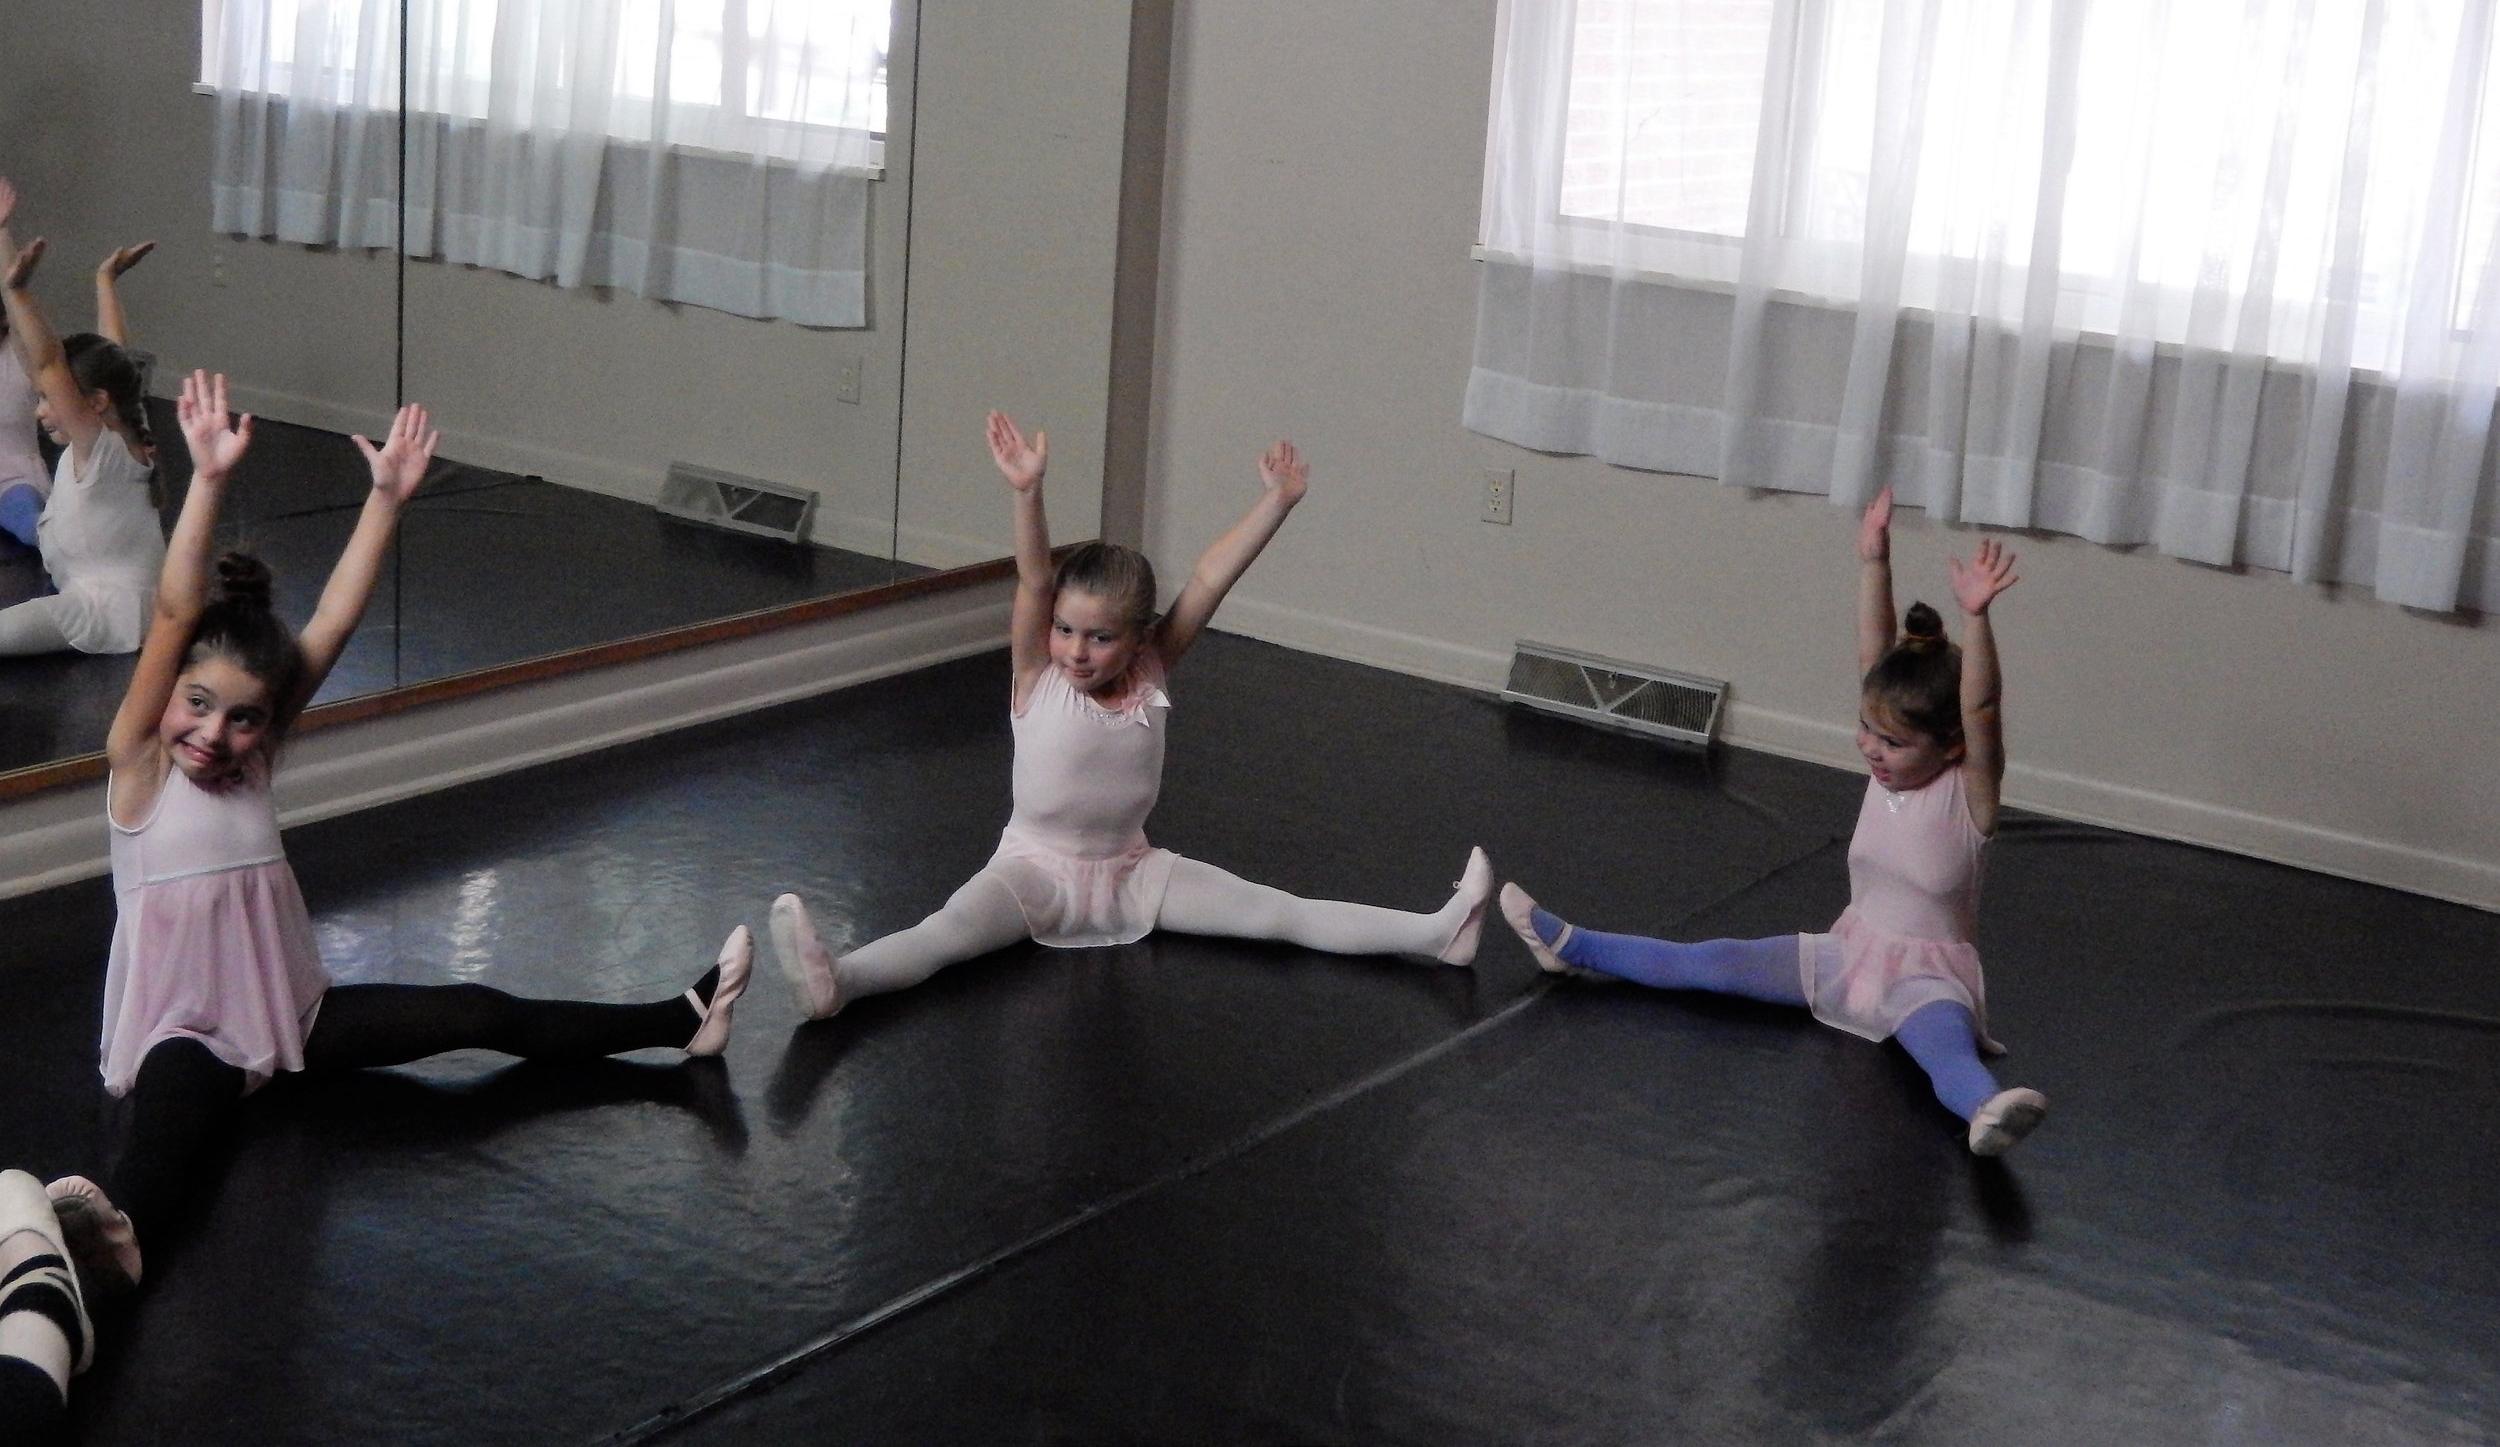 Children's Ballet Class Stretching